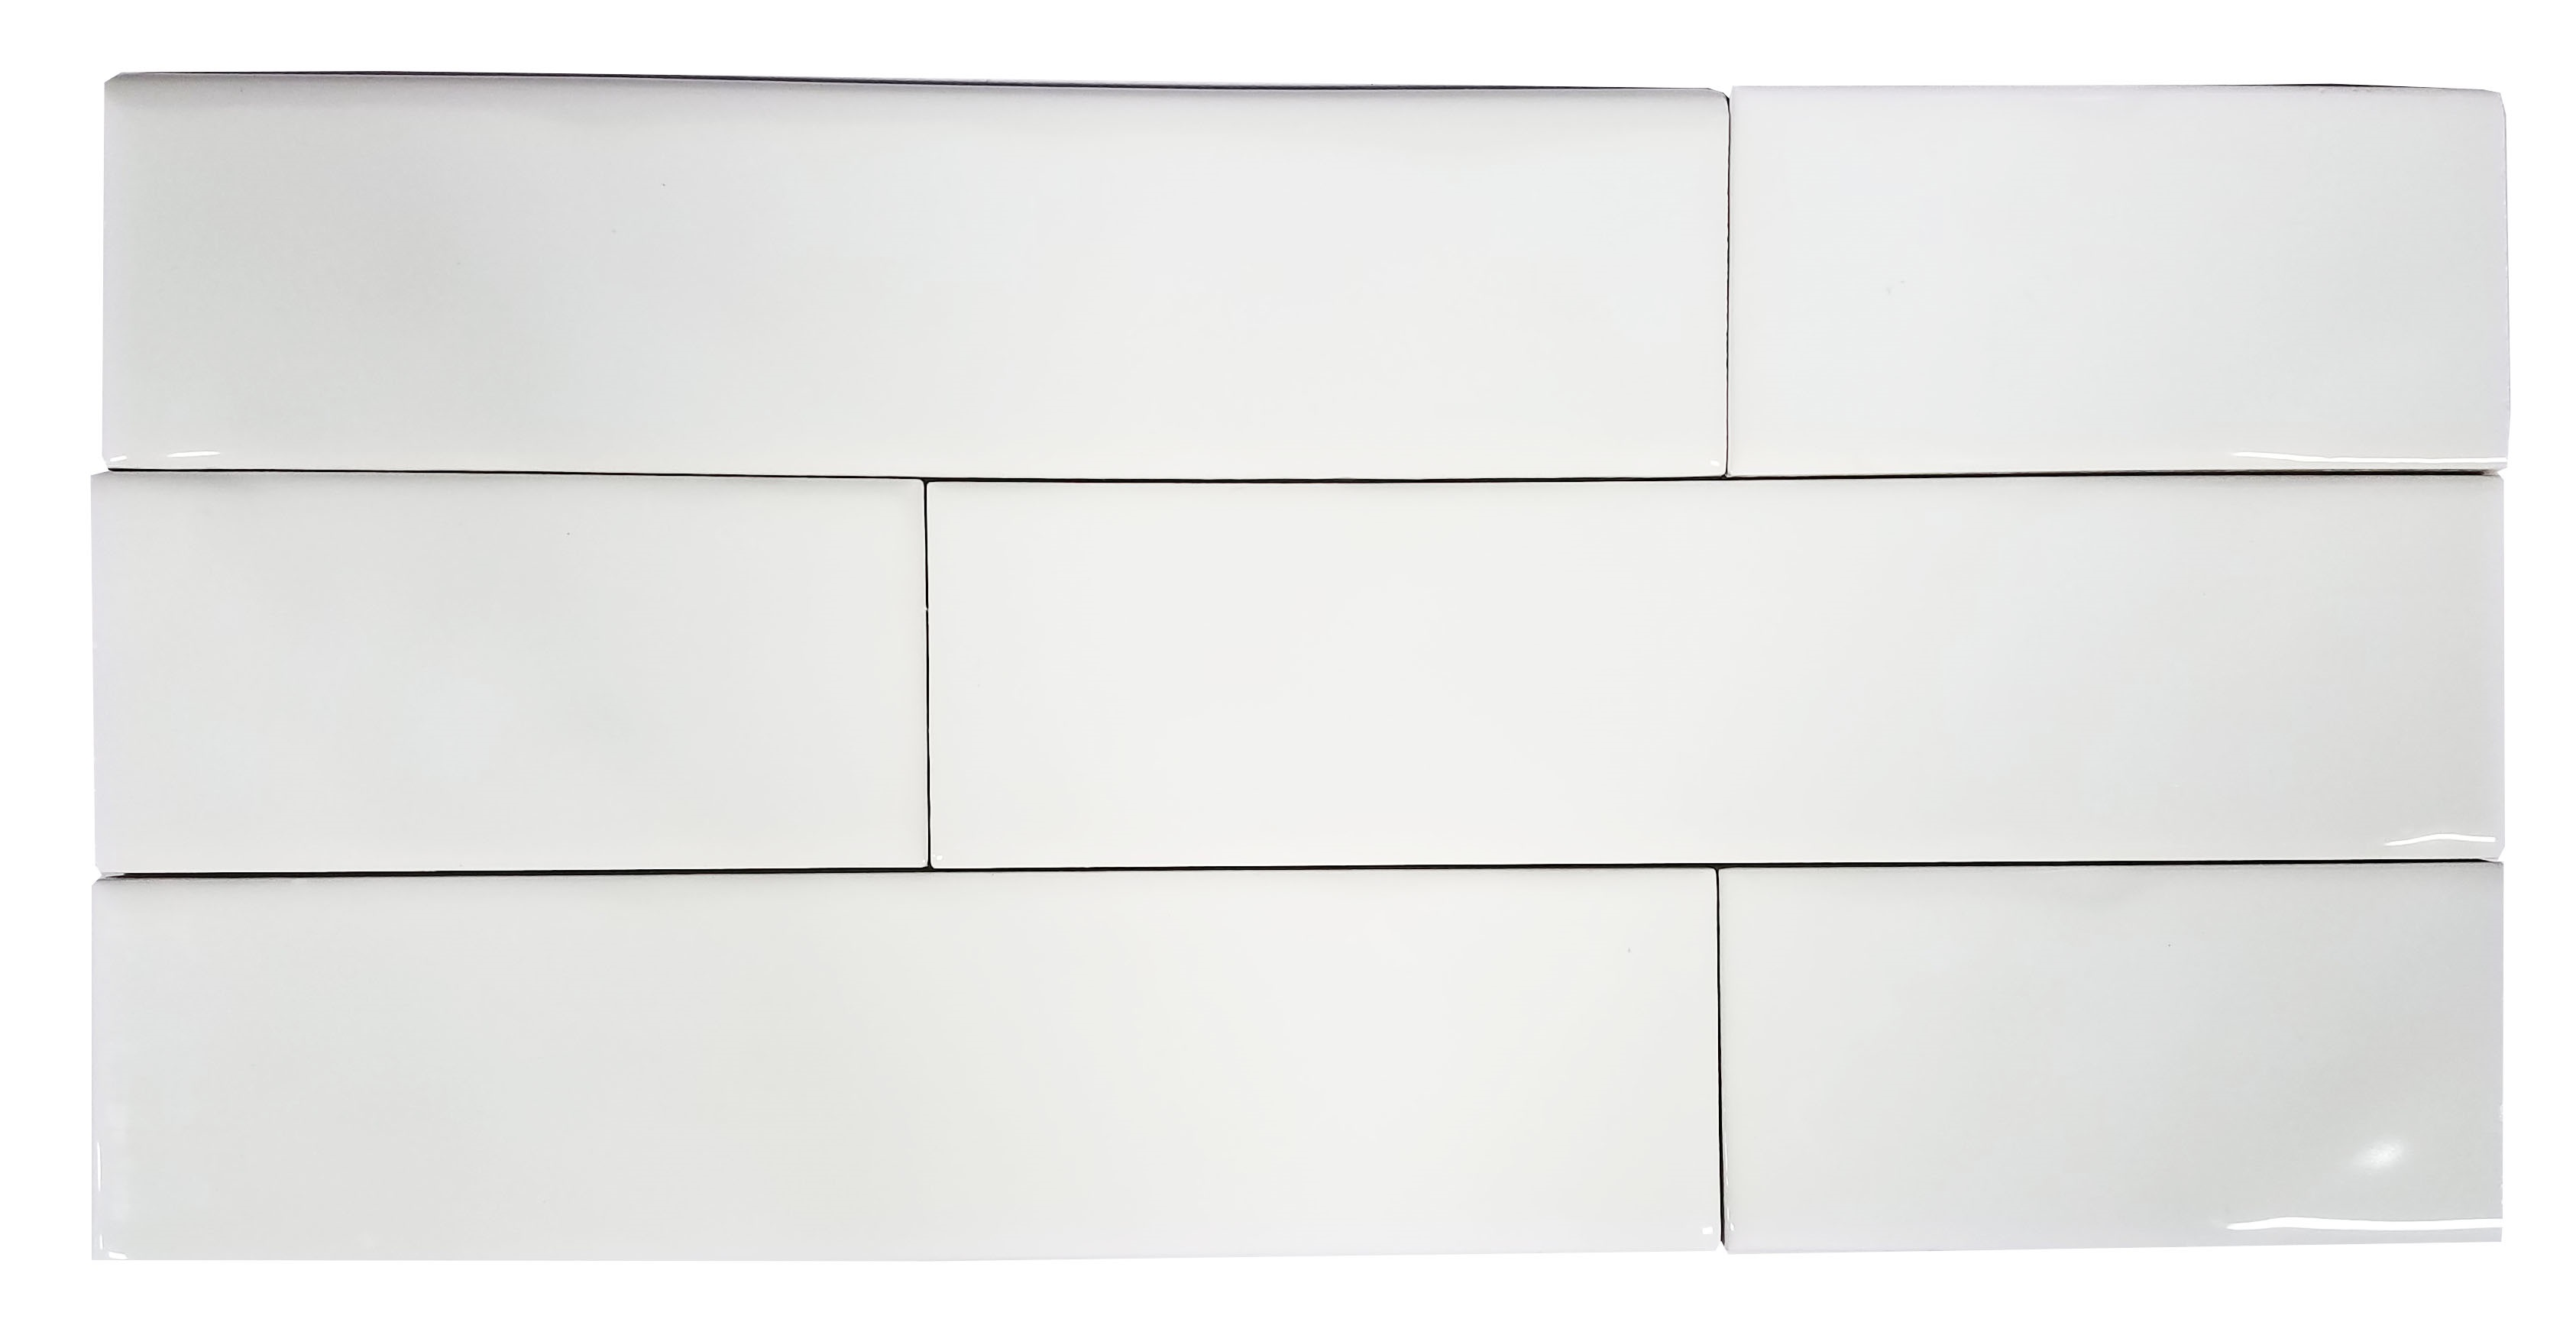 2 x 8 chelsea white ceramic wall studio